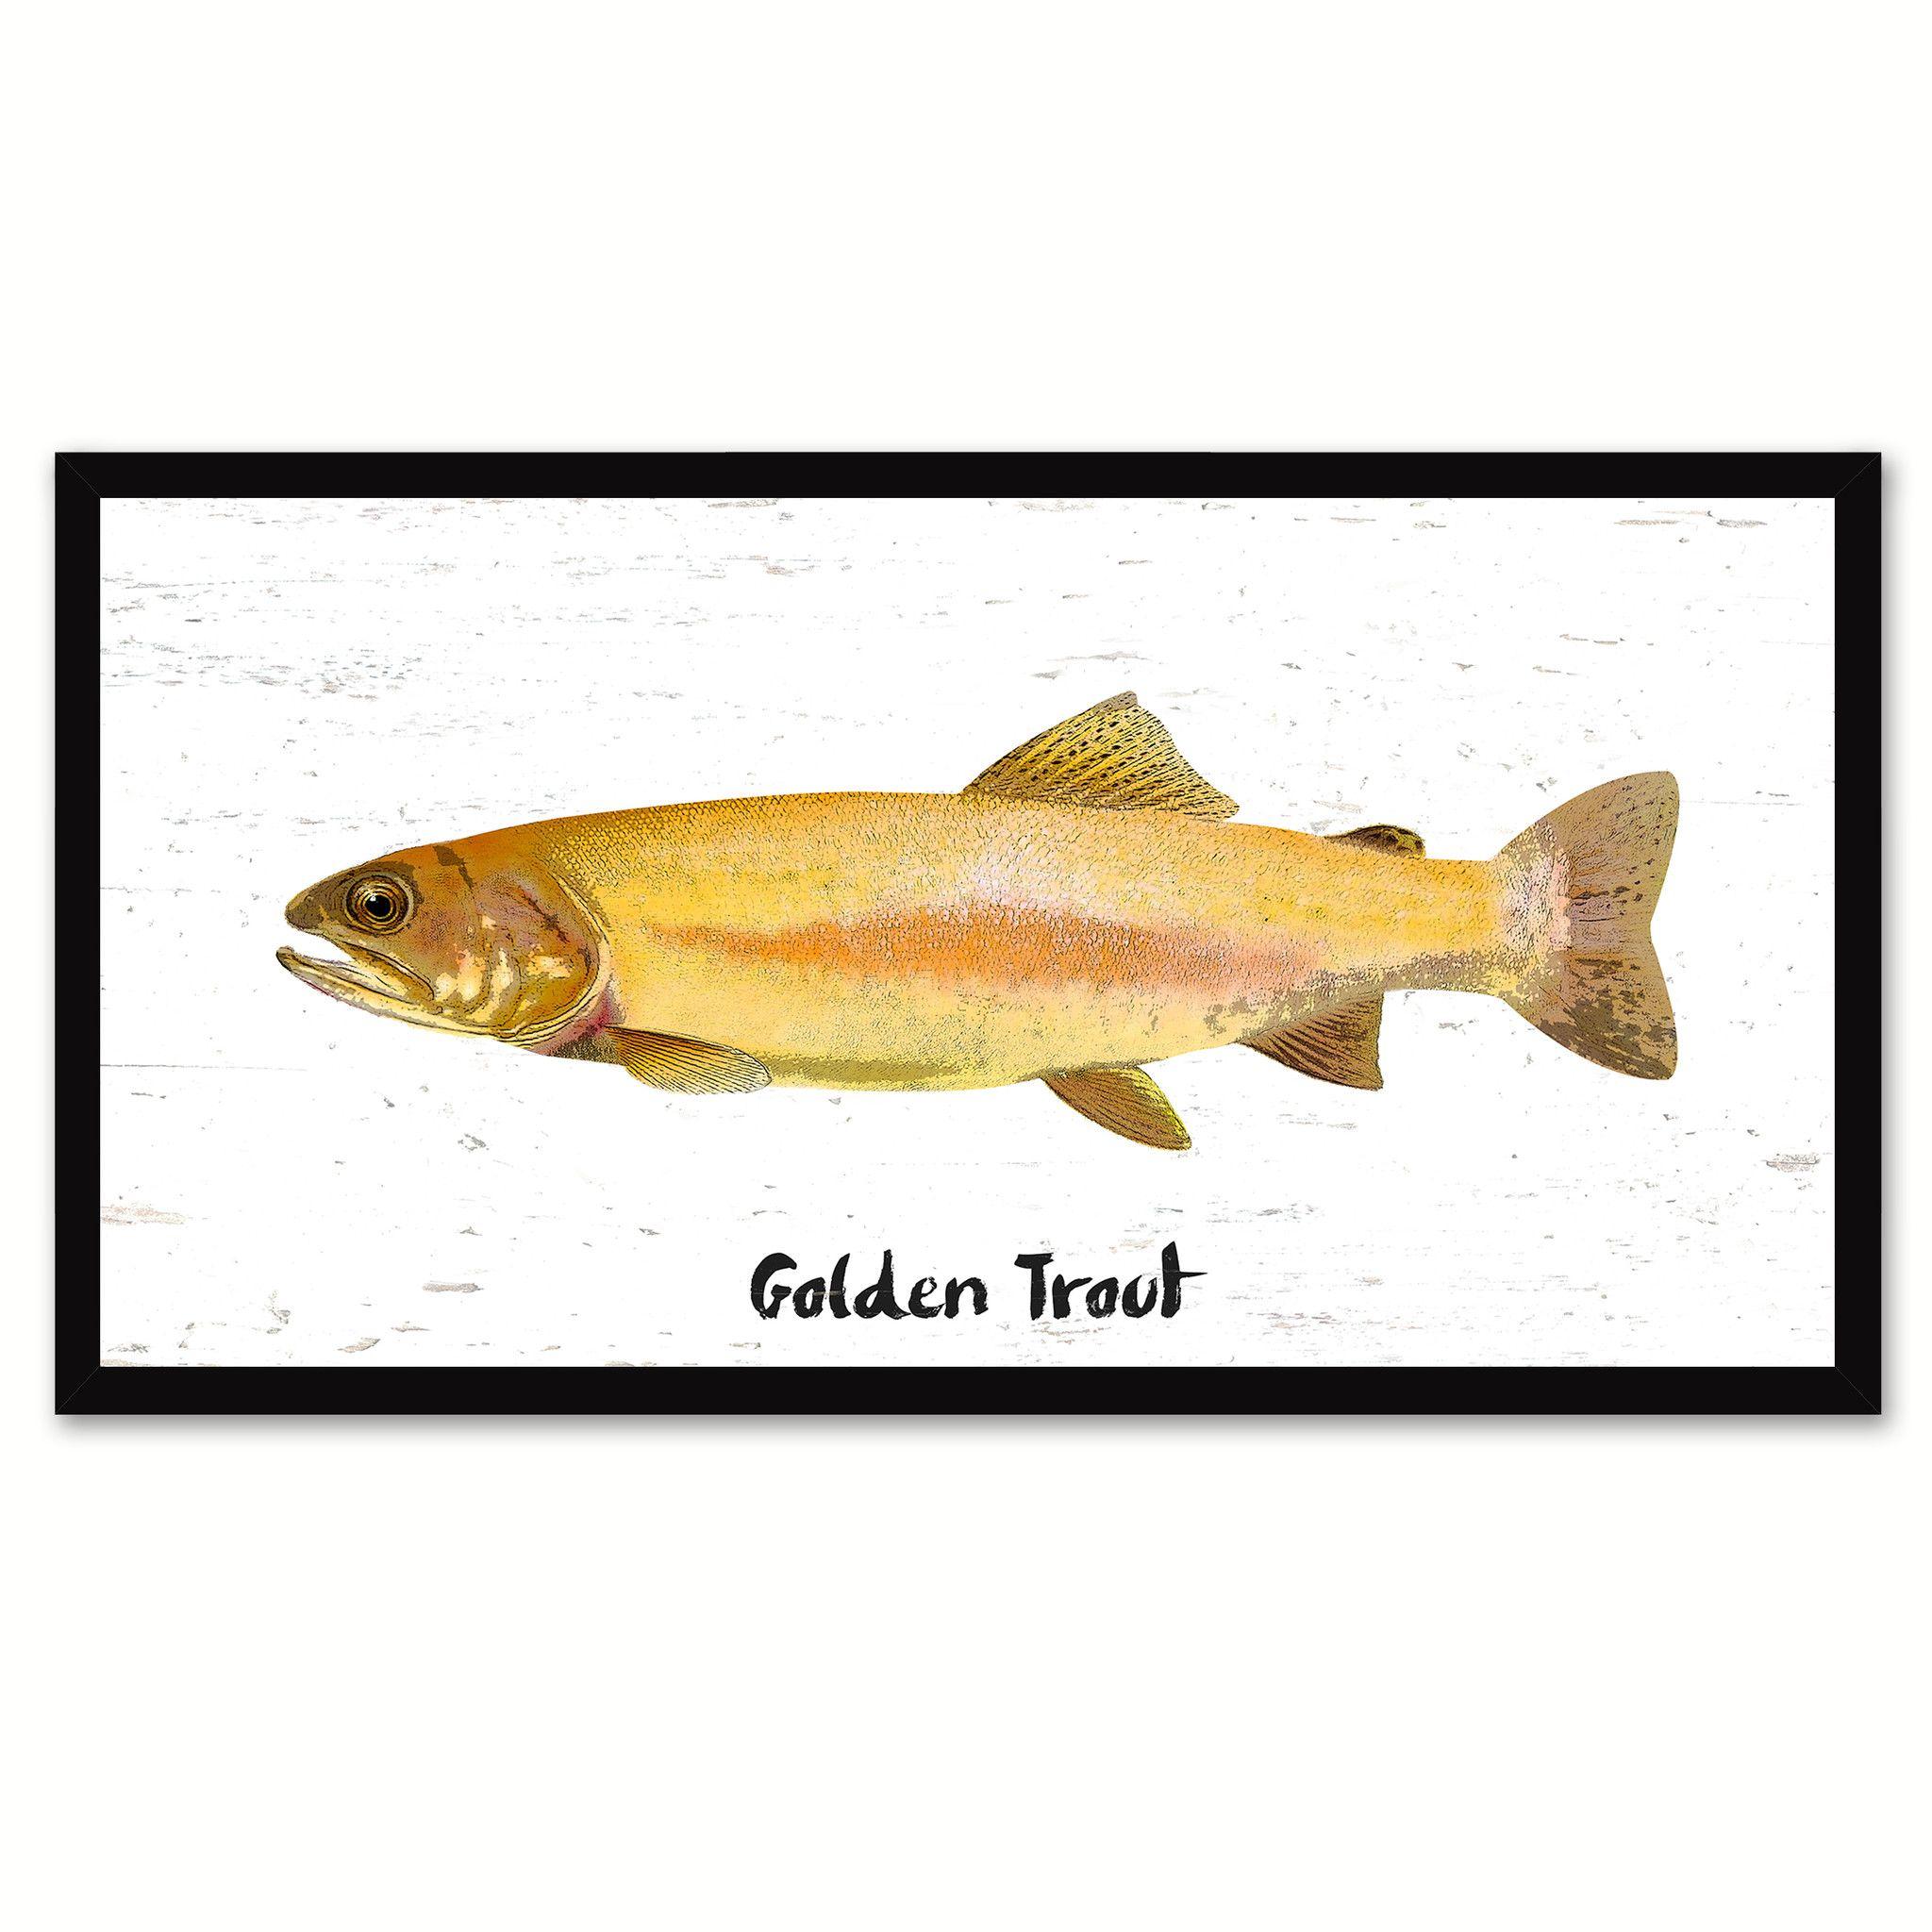 Golden Trout Fish Painting Reproduction Canvas Print Picture ...